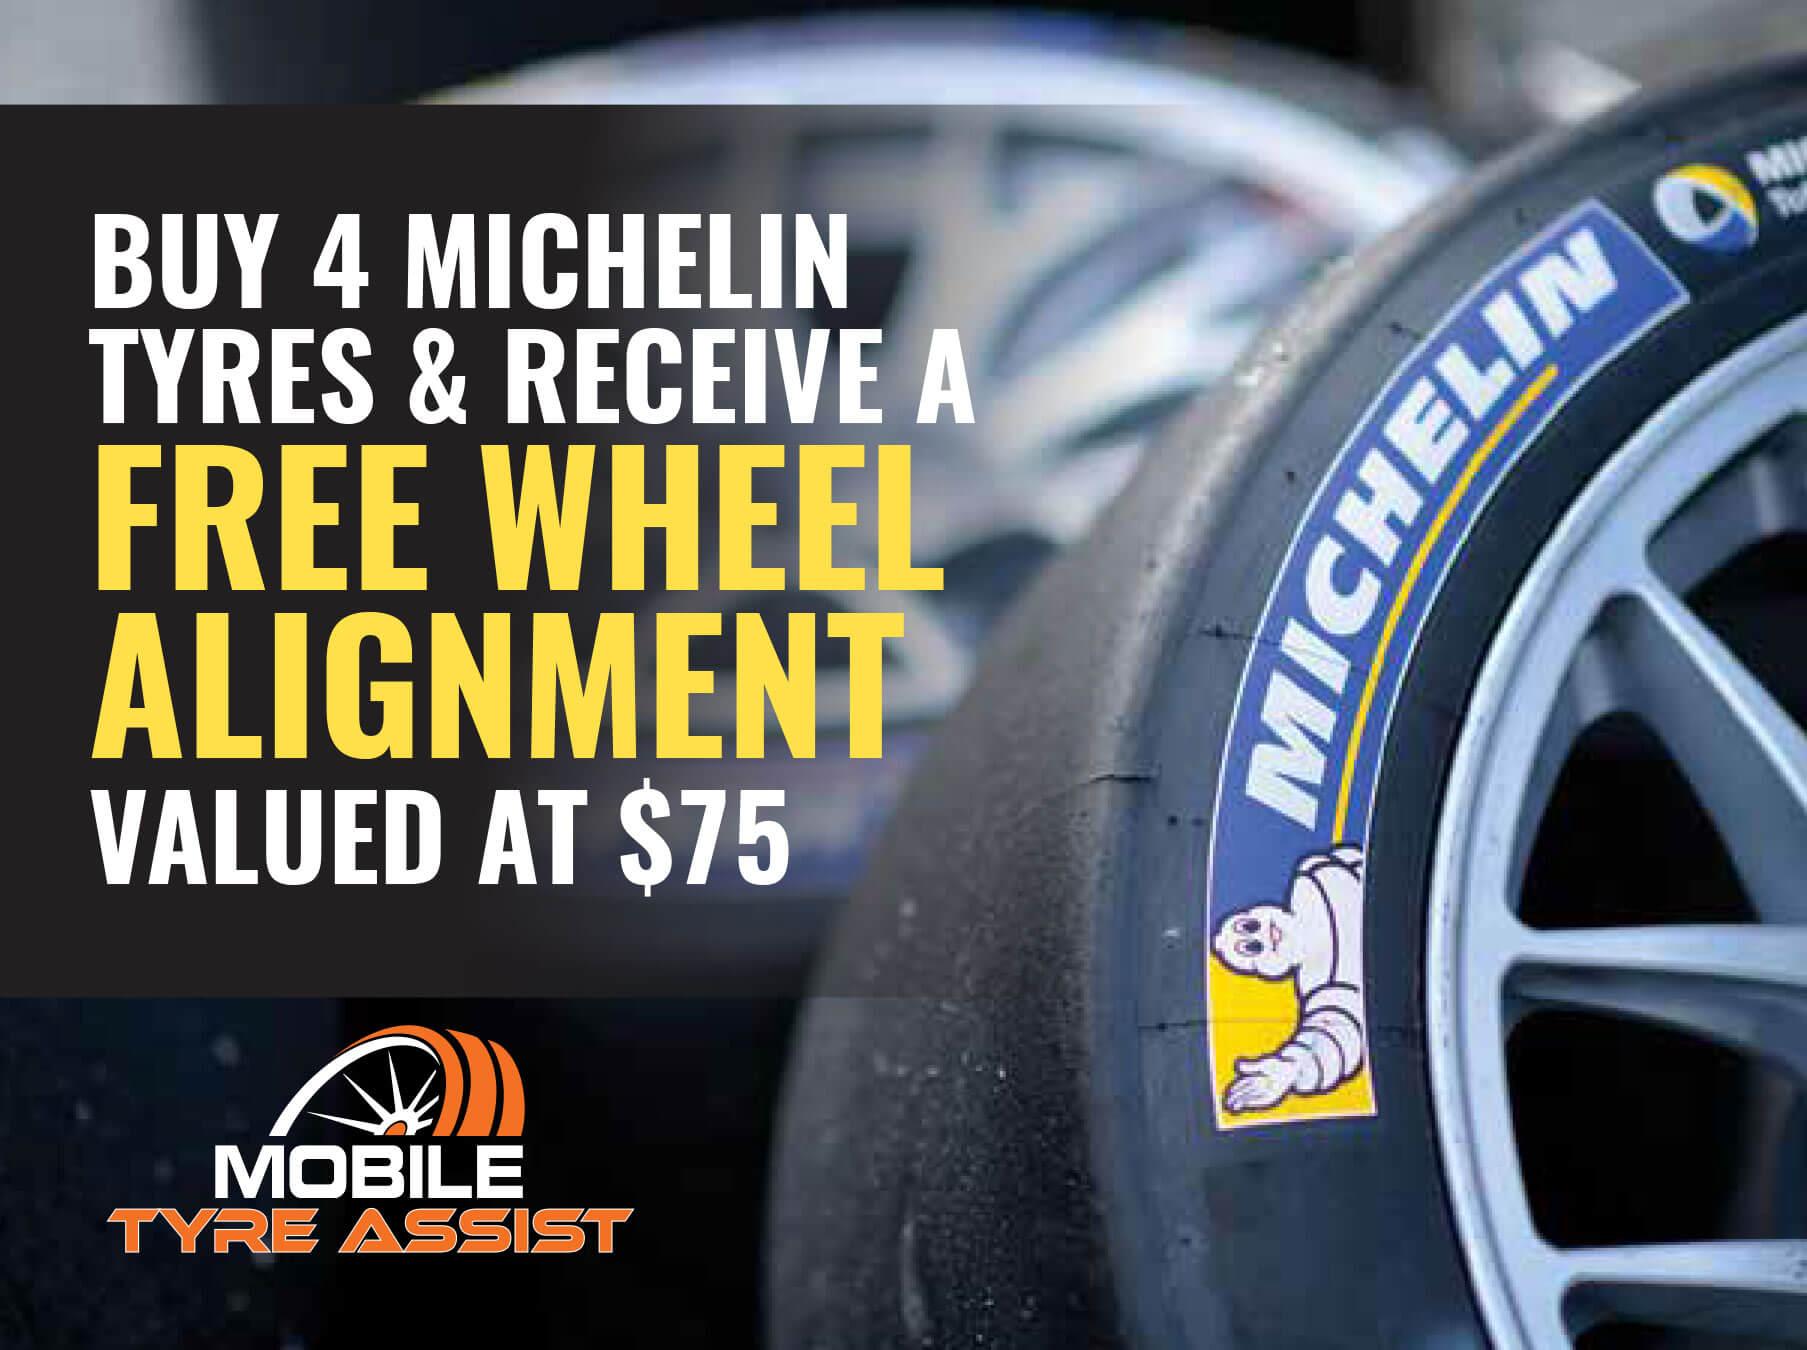 Michelin Wheel Alignment Tyre Assist